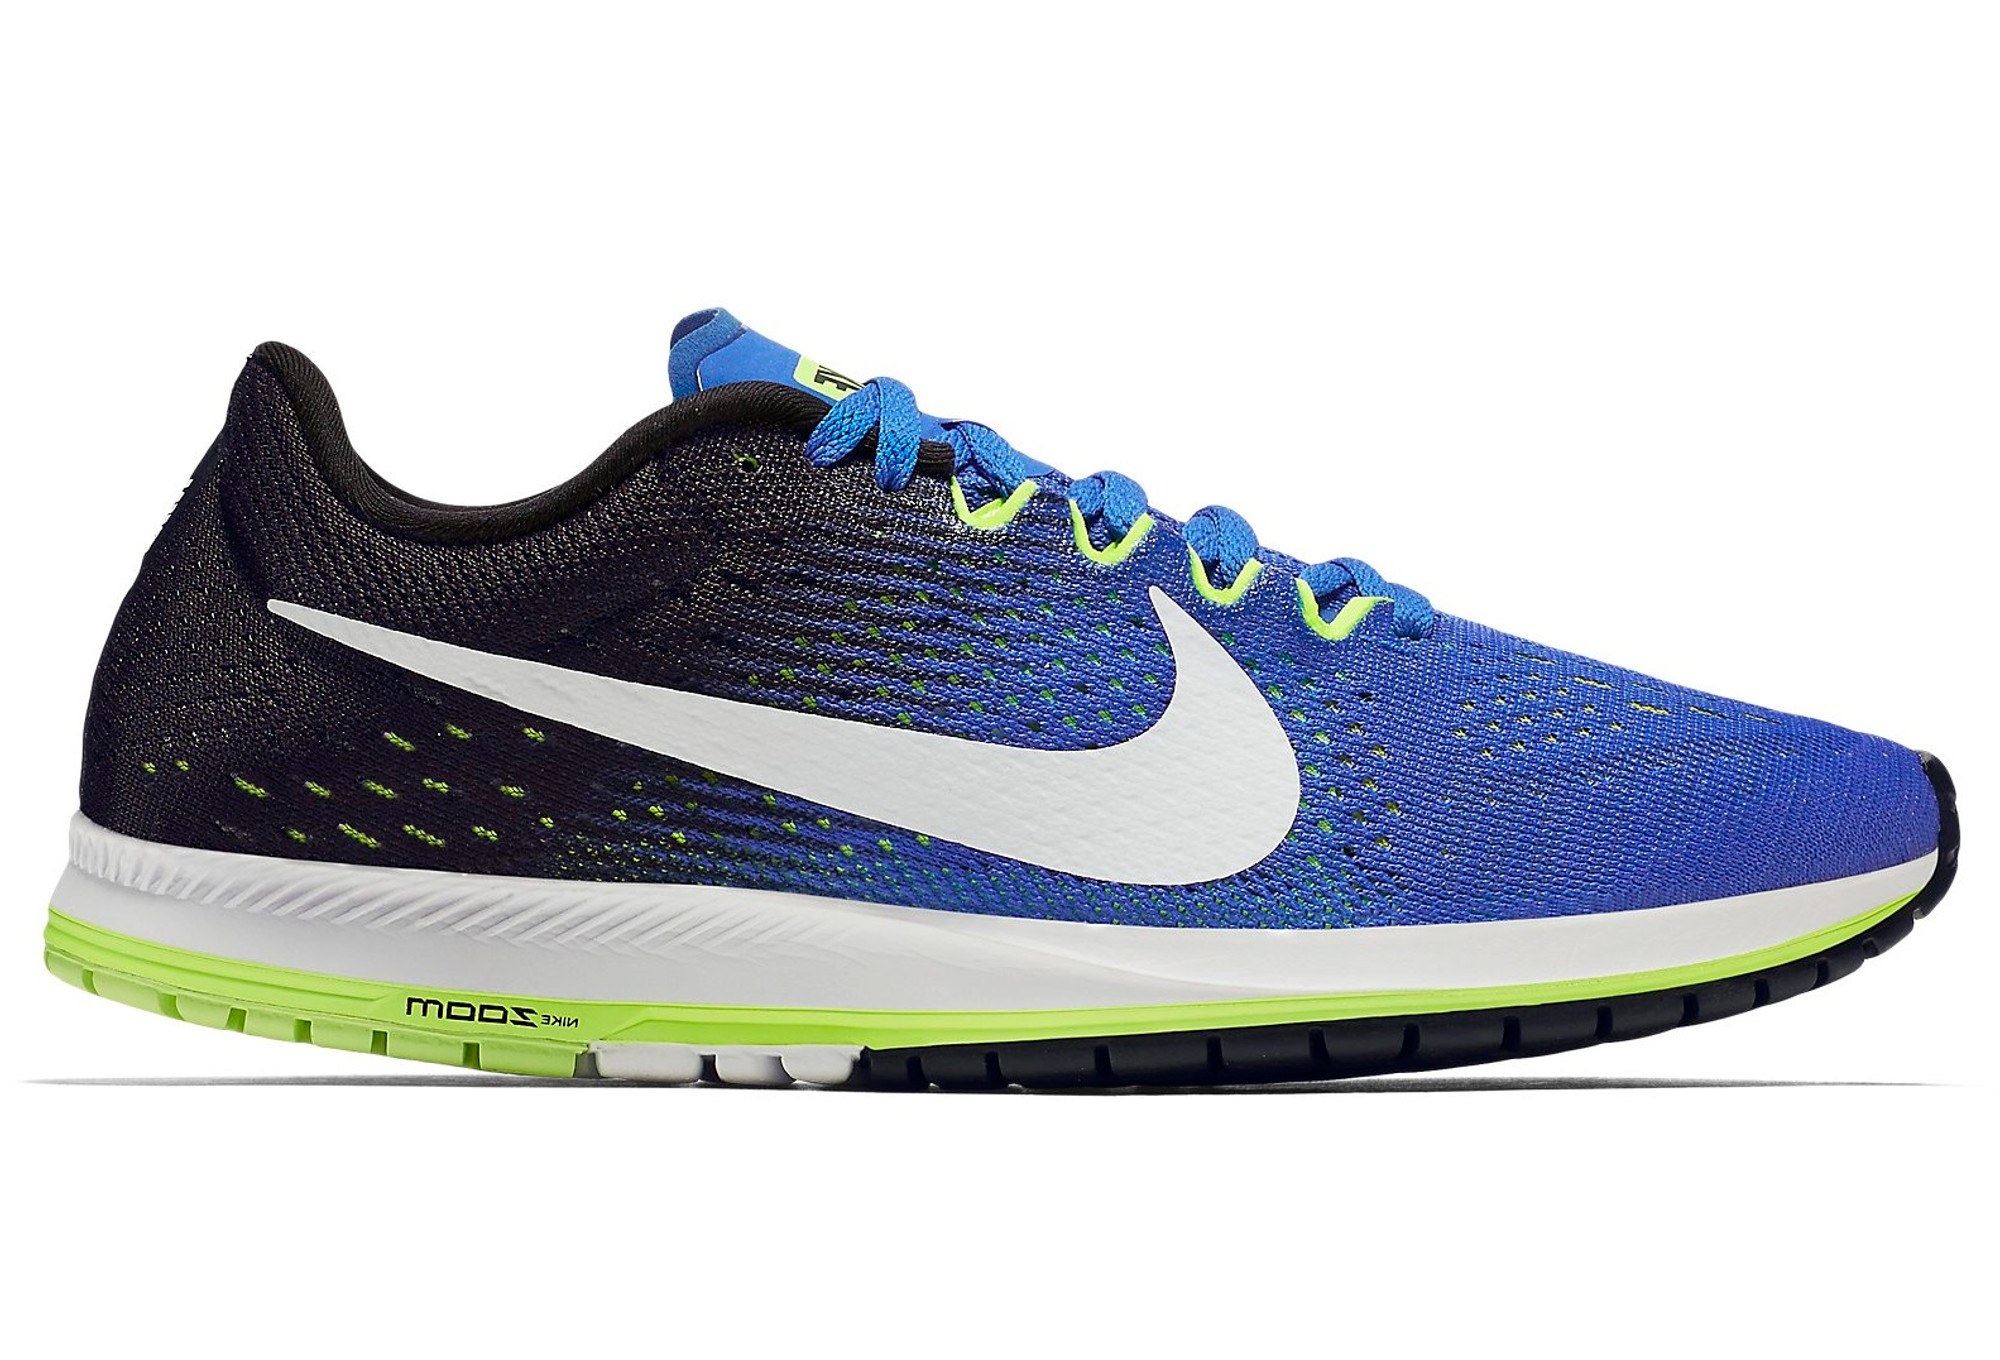 purchase cheap d9d78 51d8c Zapatillas Nike ZOOM STREAK 6 para Mujer¤Hombre